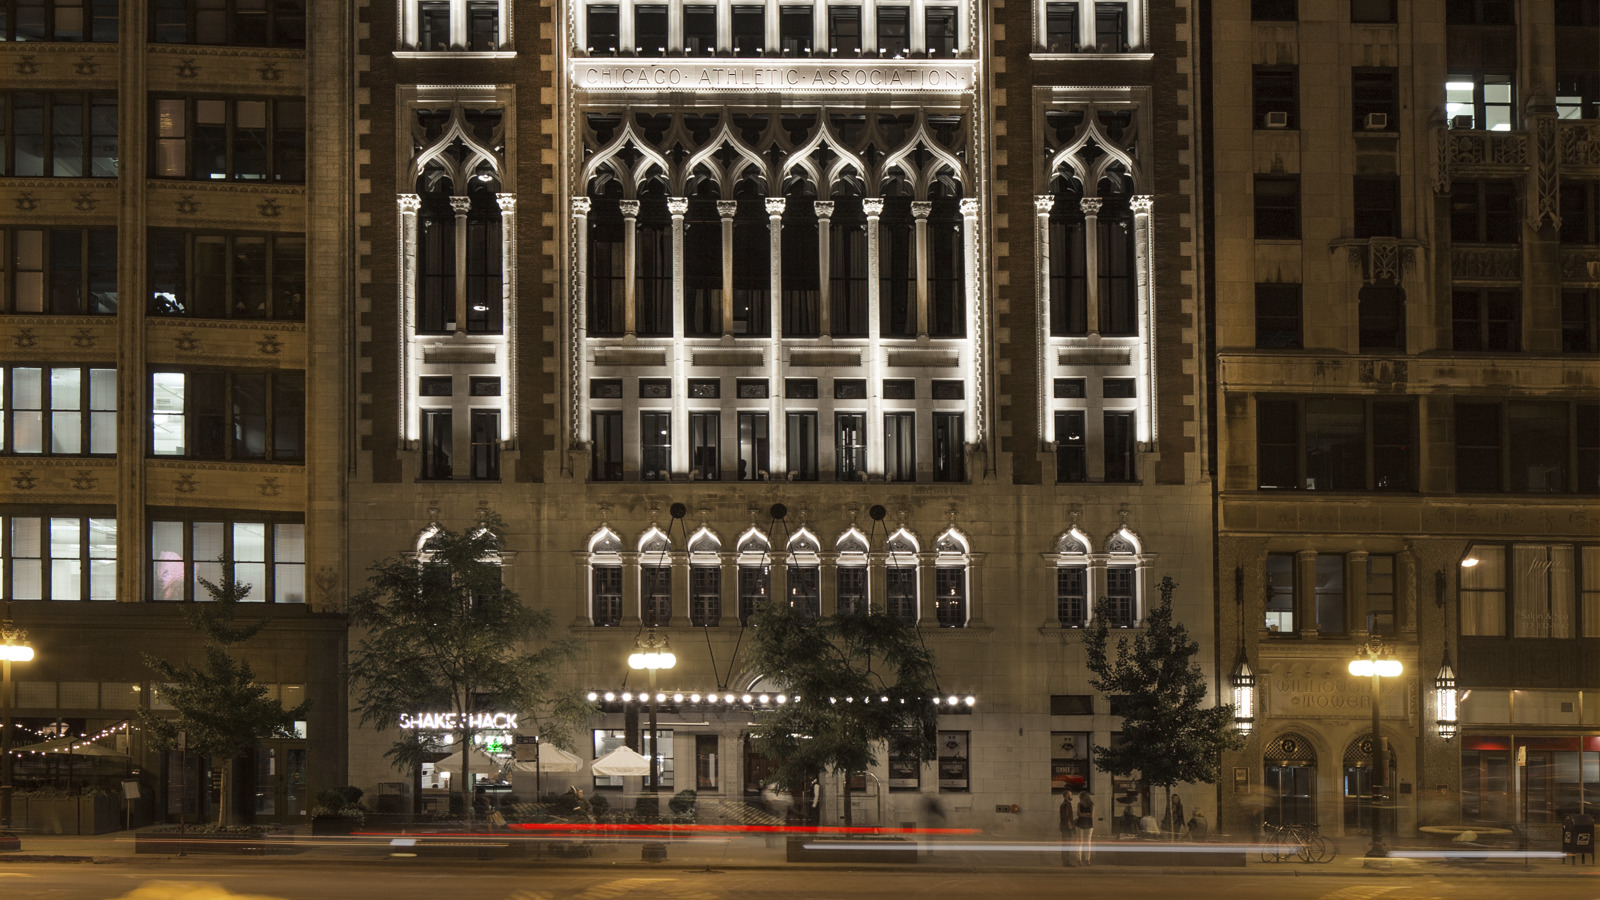 Merveilleux Chicago Athletic Association_Exterior_Night_Thomas Shelby